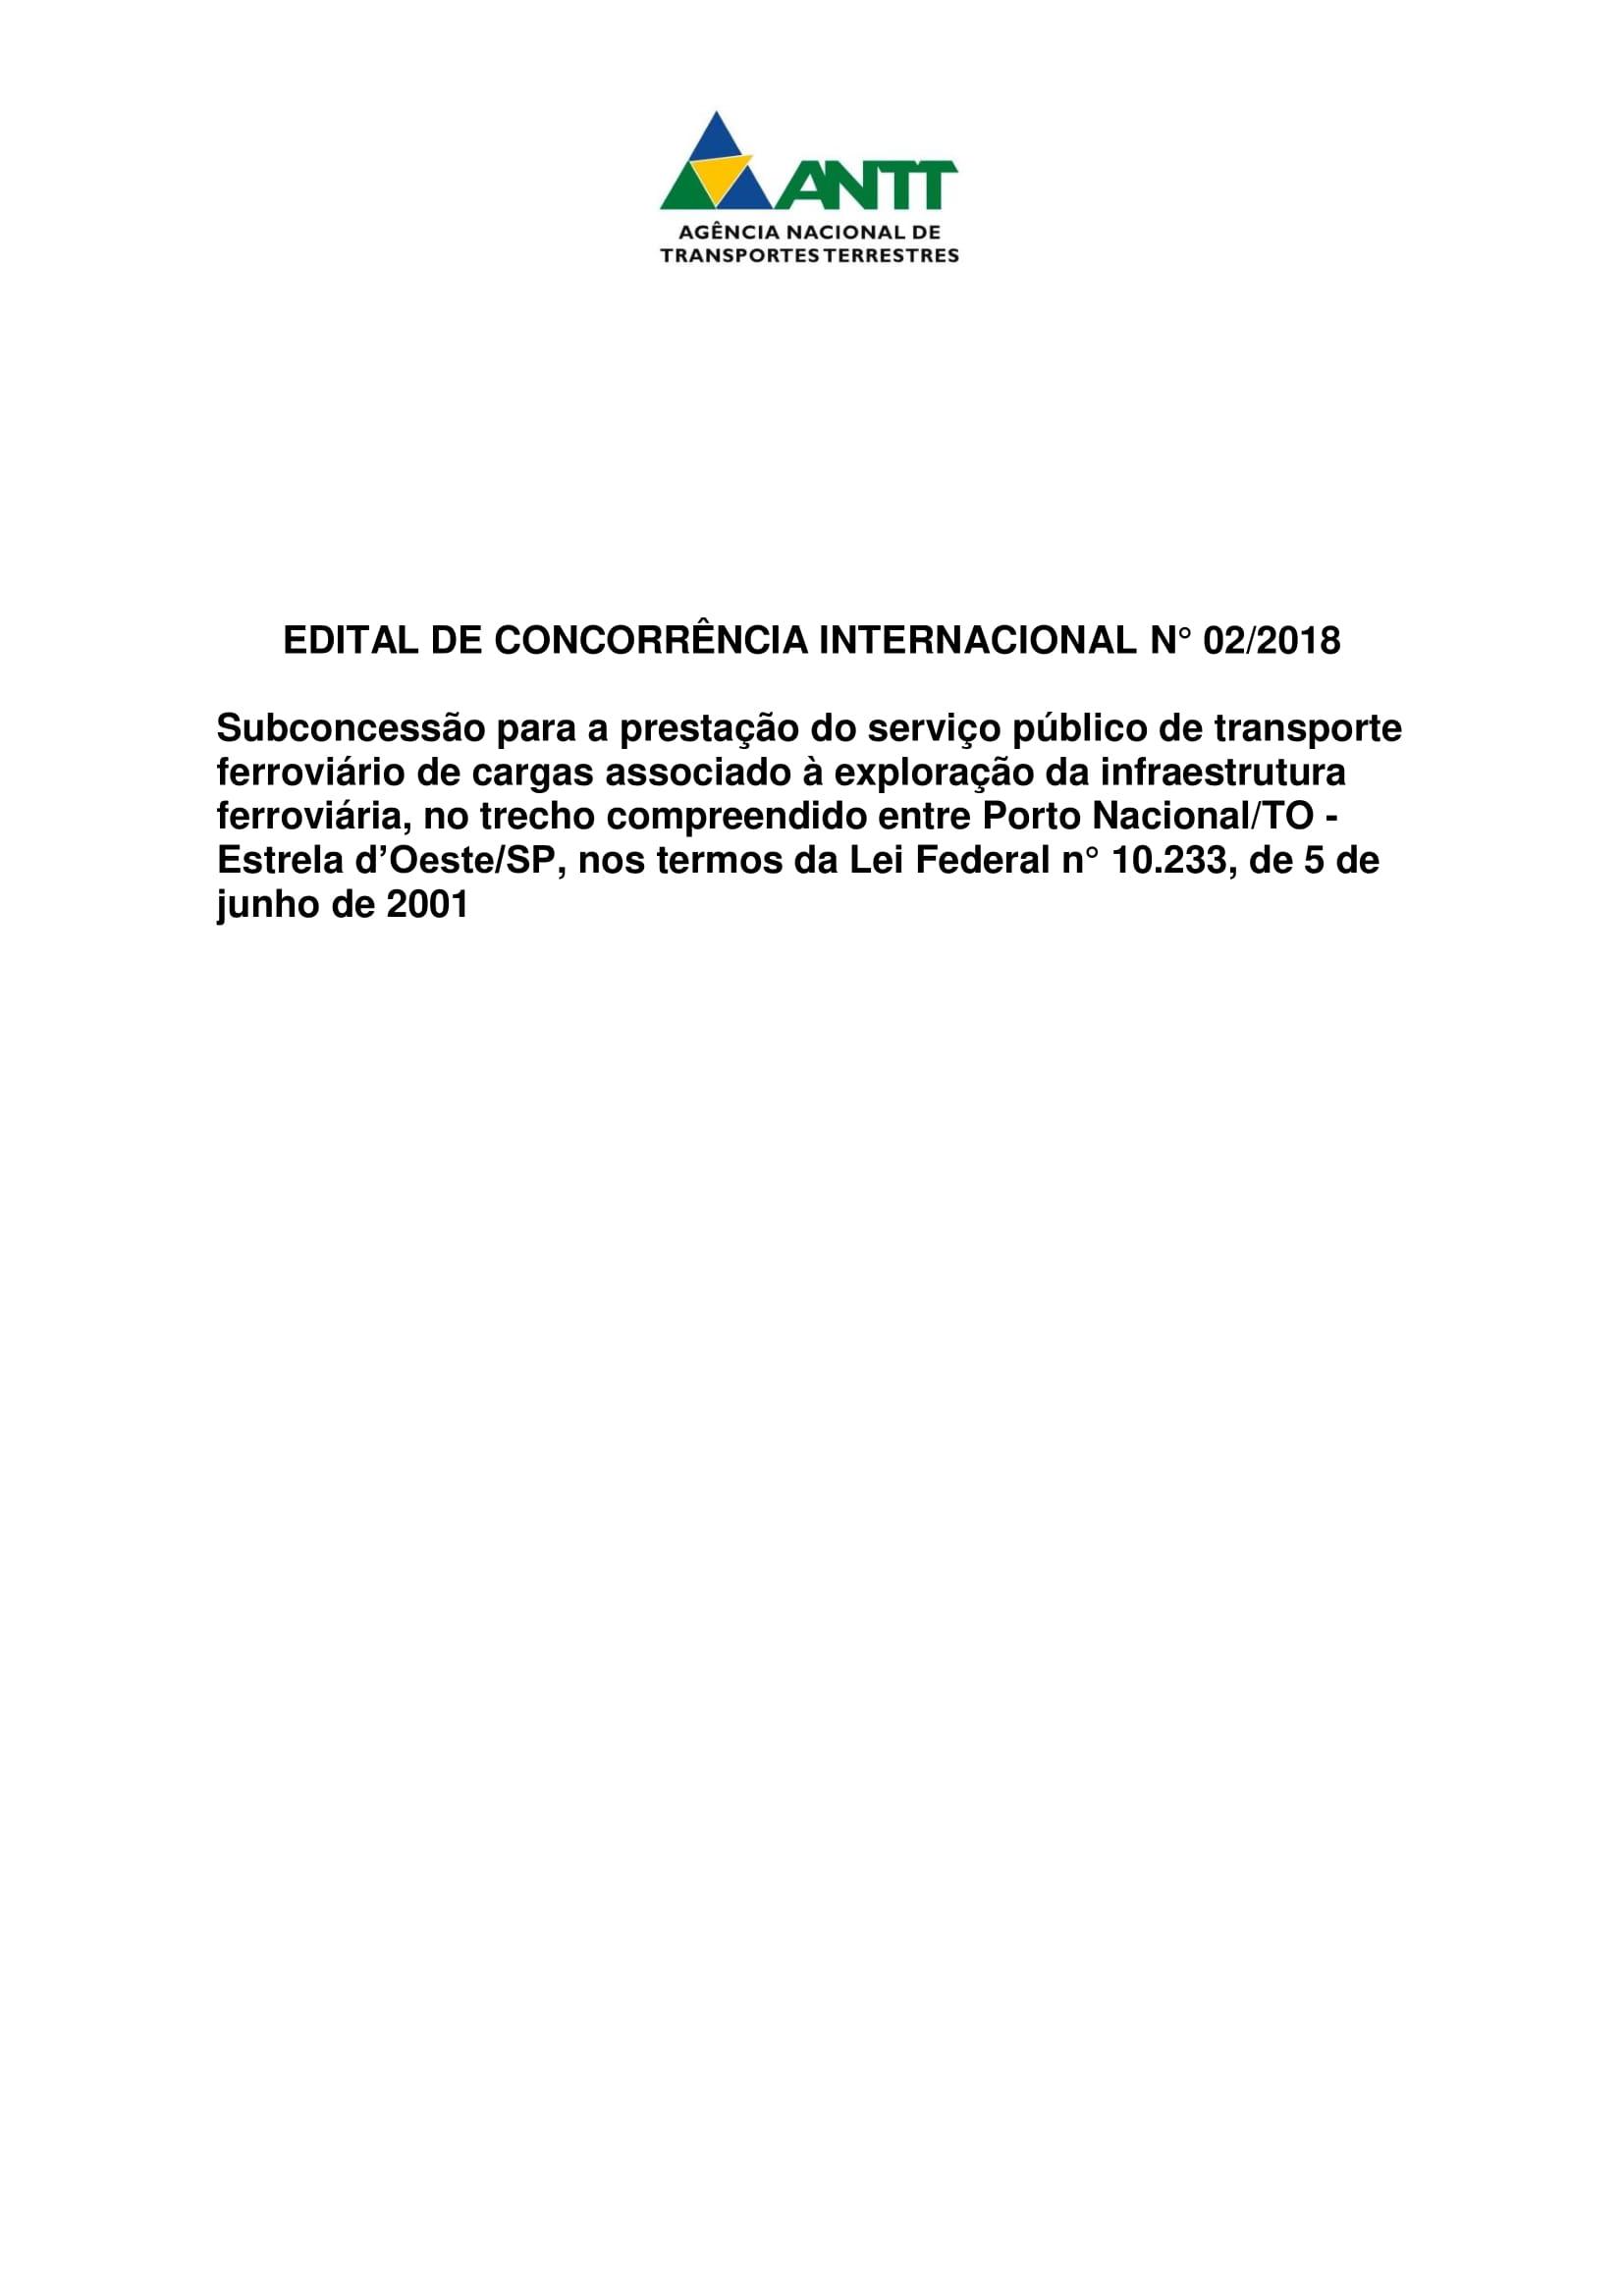 minuta_de_edital_-_porto_nacional-estrela_doeste-01